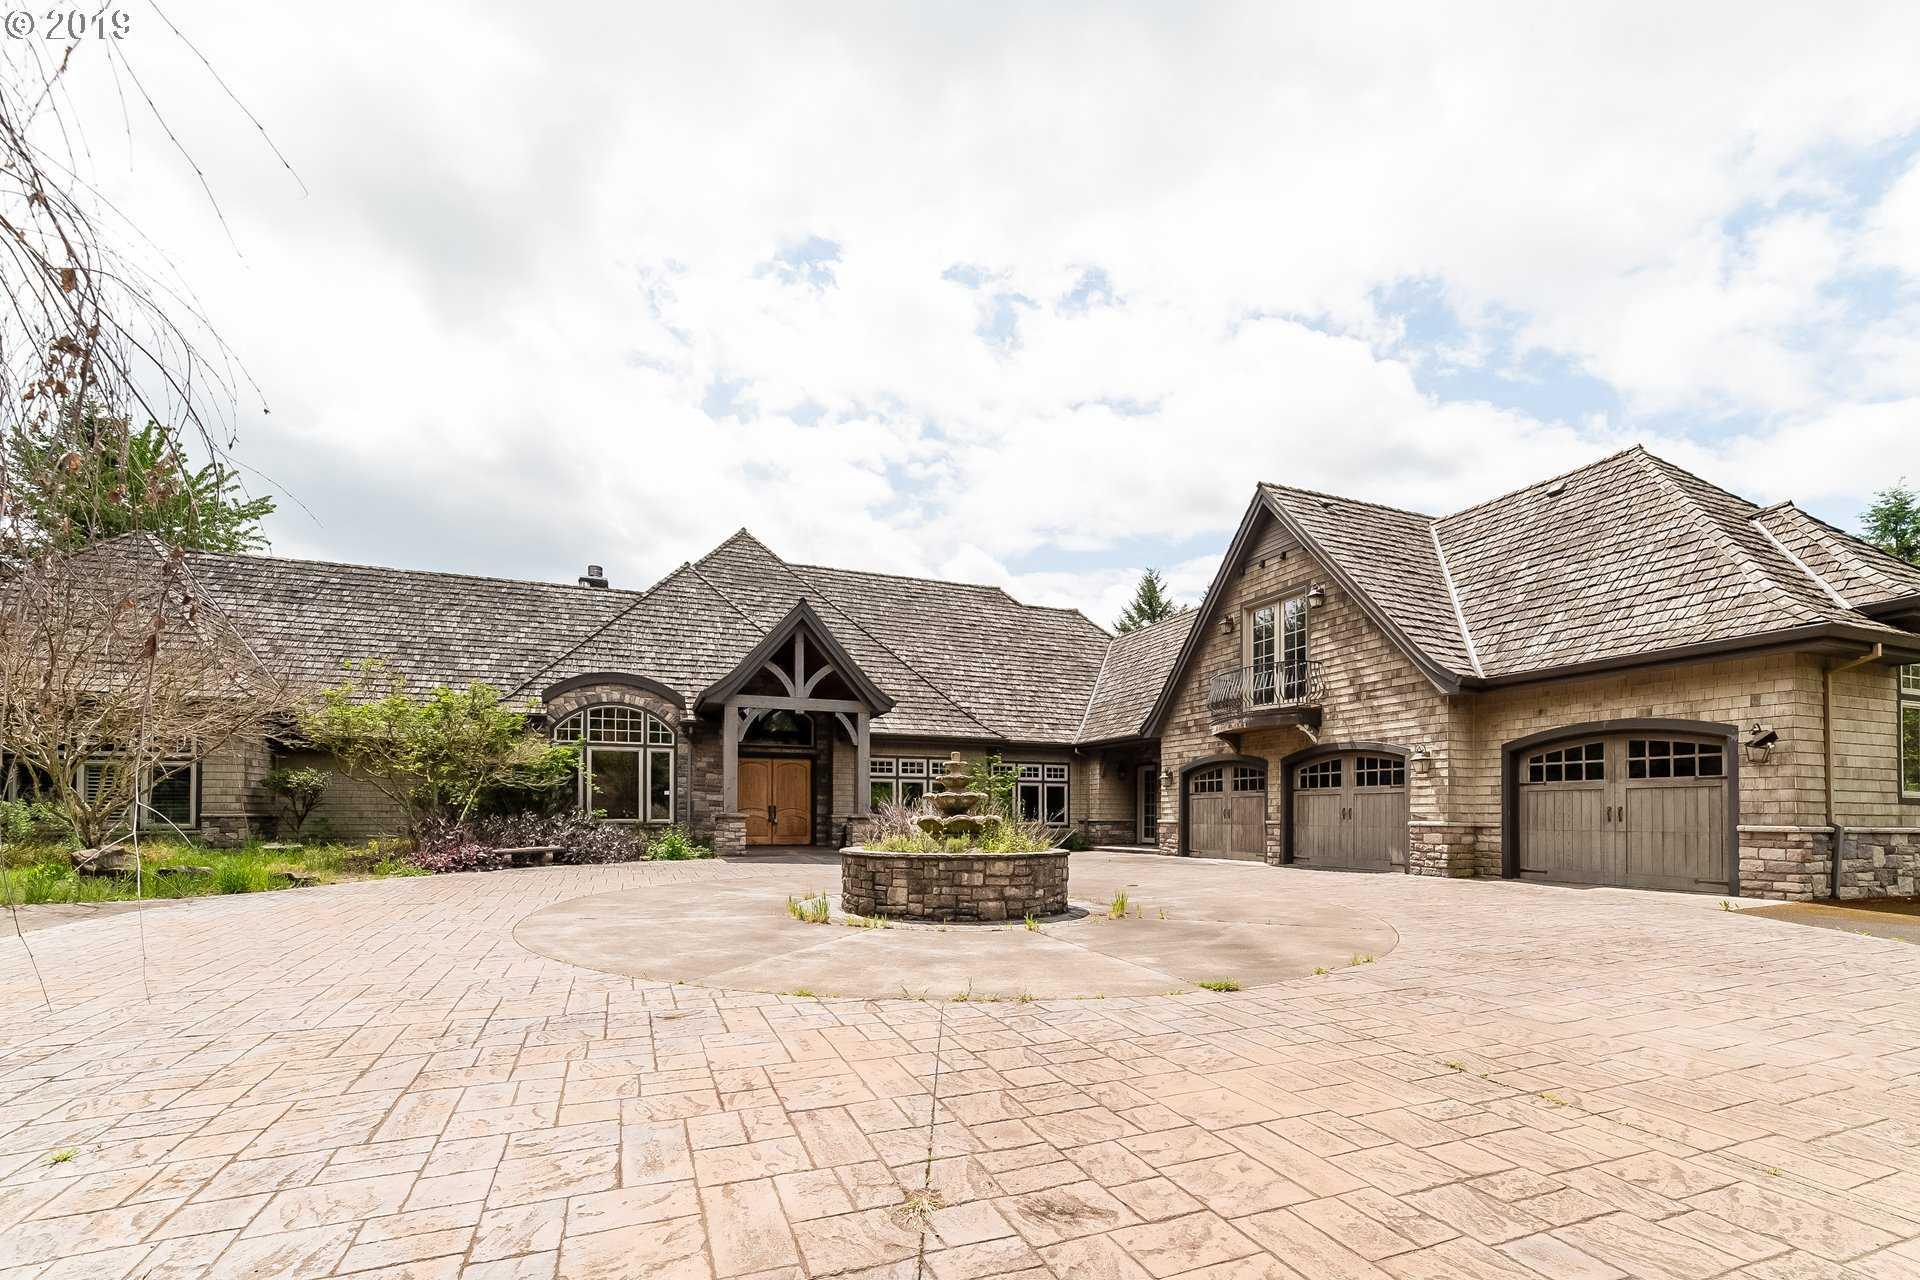 $1,440,000 - 4Br/5Ba -  for Sale in Wilsonville